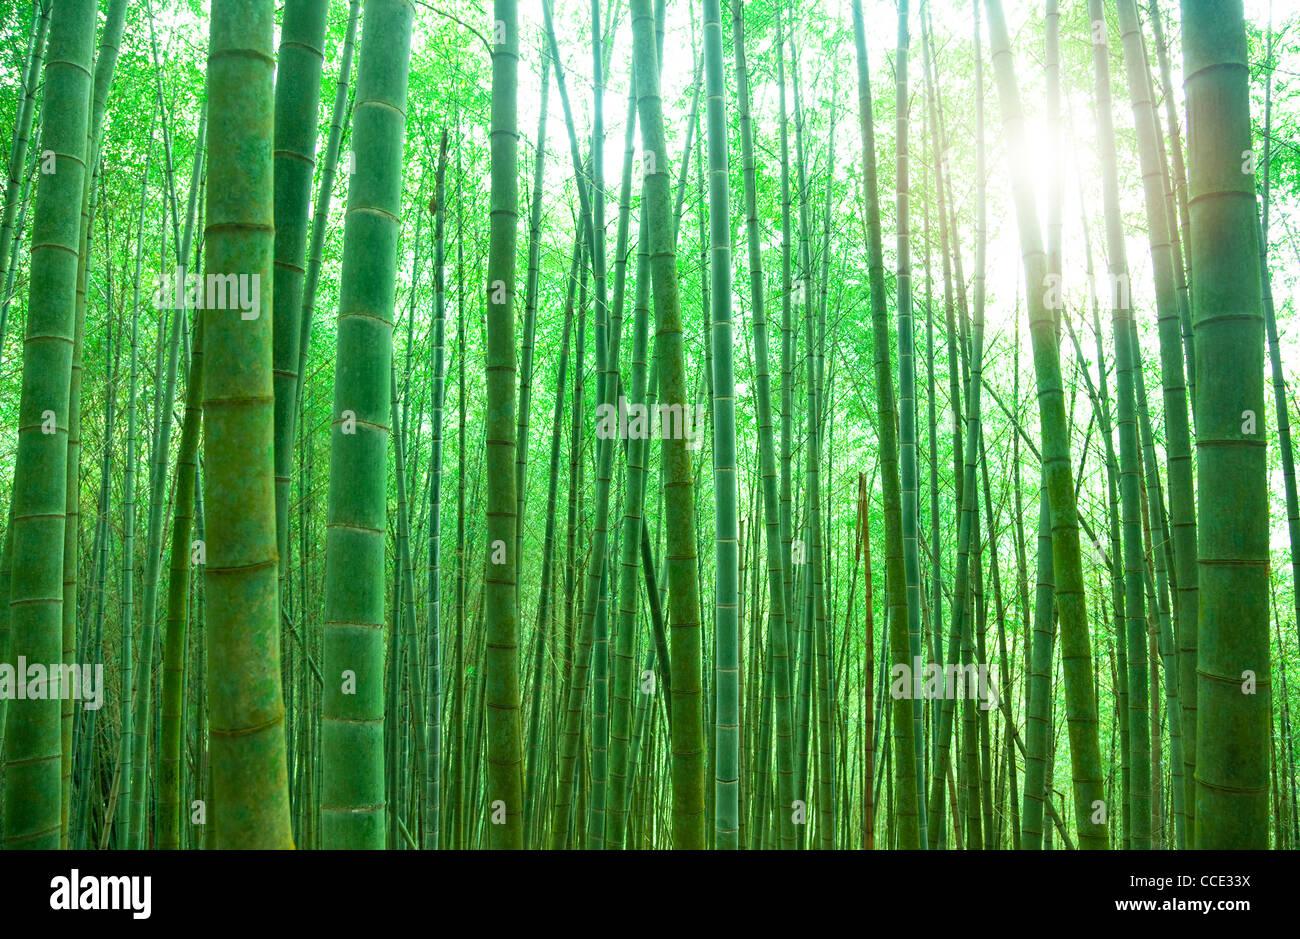 grüner Bambuswald mit Sonnenlicht Stockbild